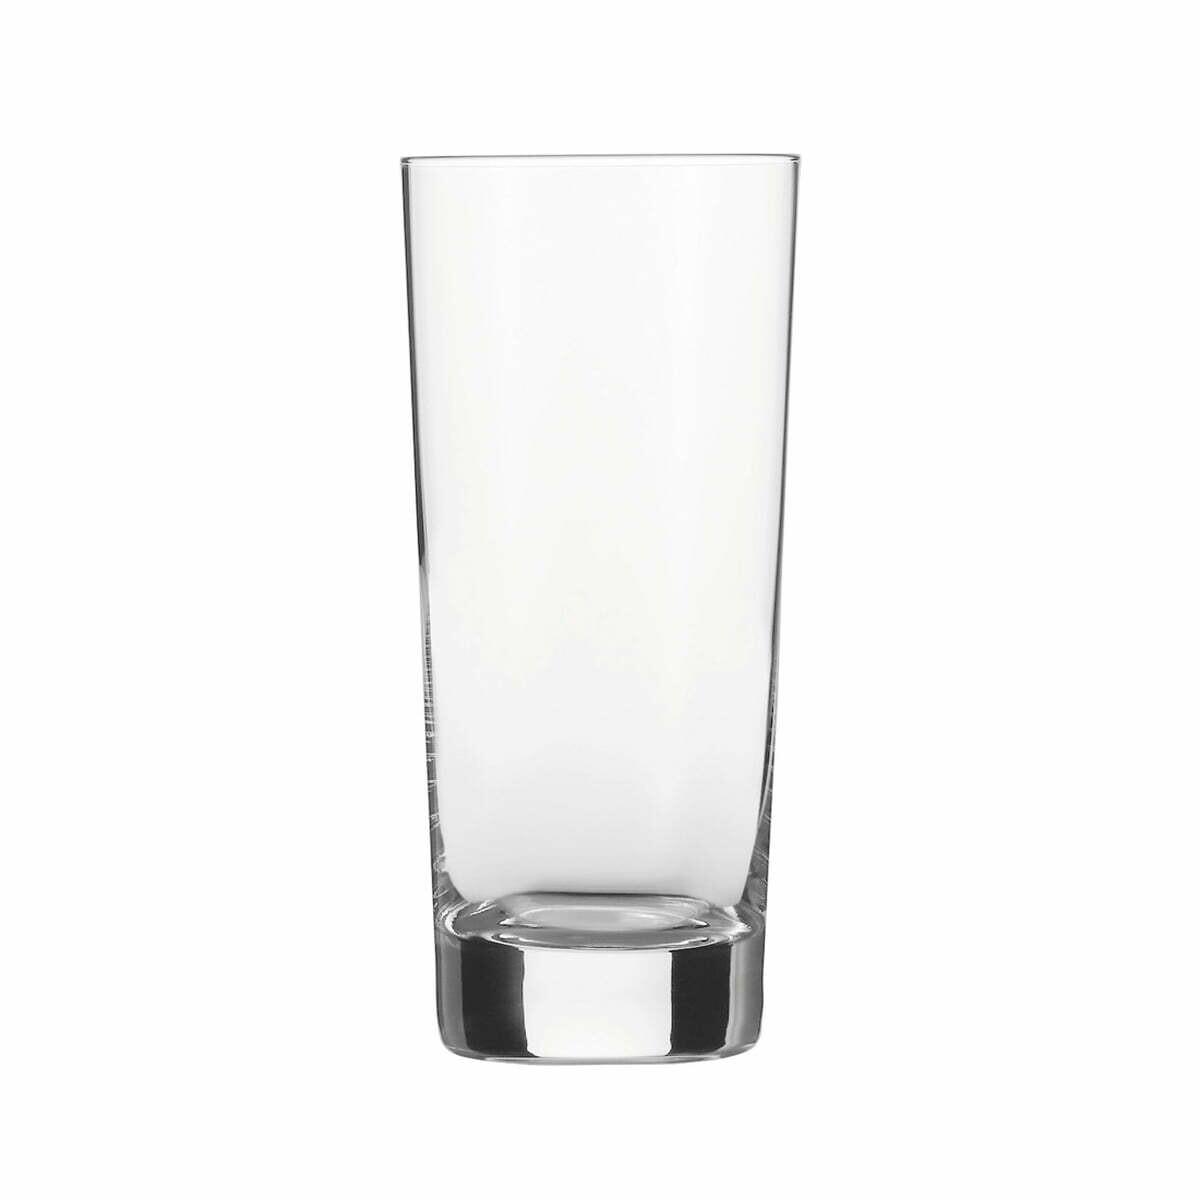 BAR - Coffret de 6 verres Longdrink